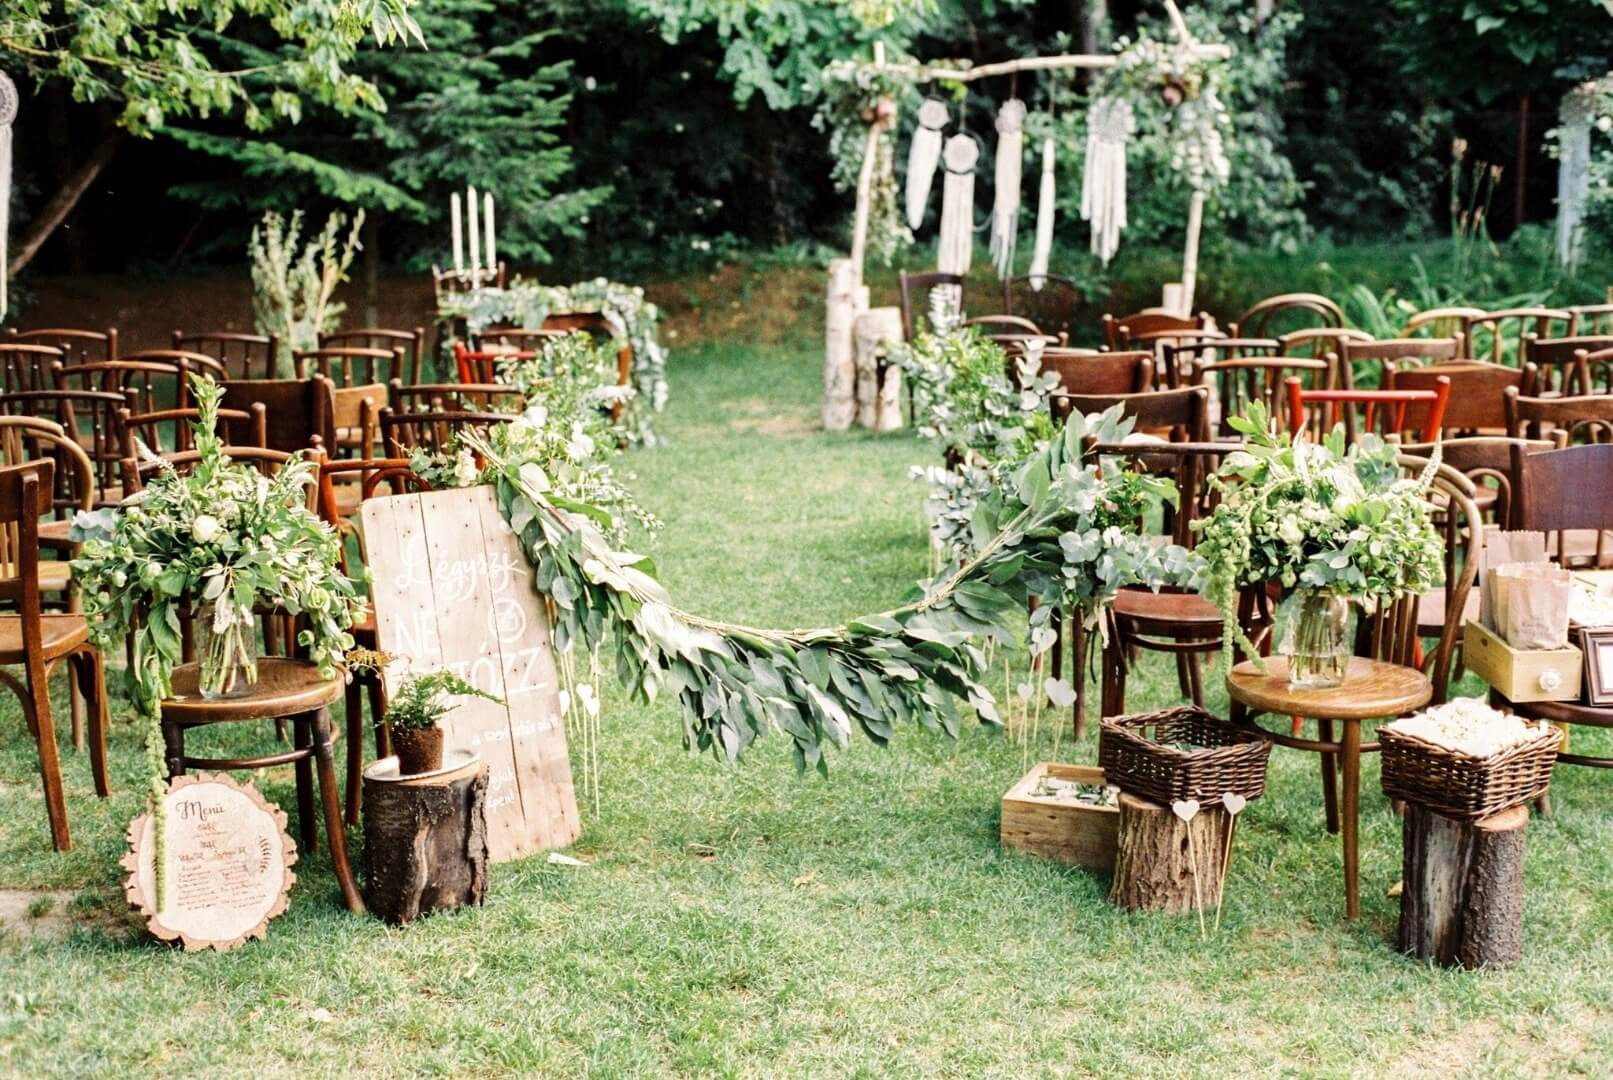 Natural Wedding Decor Vighadalom Eskvi Szolgltatk